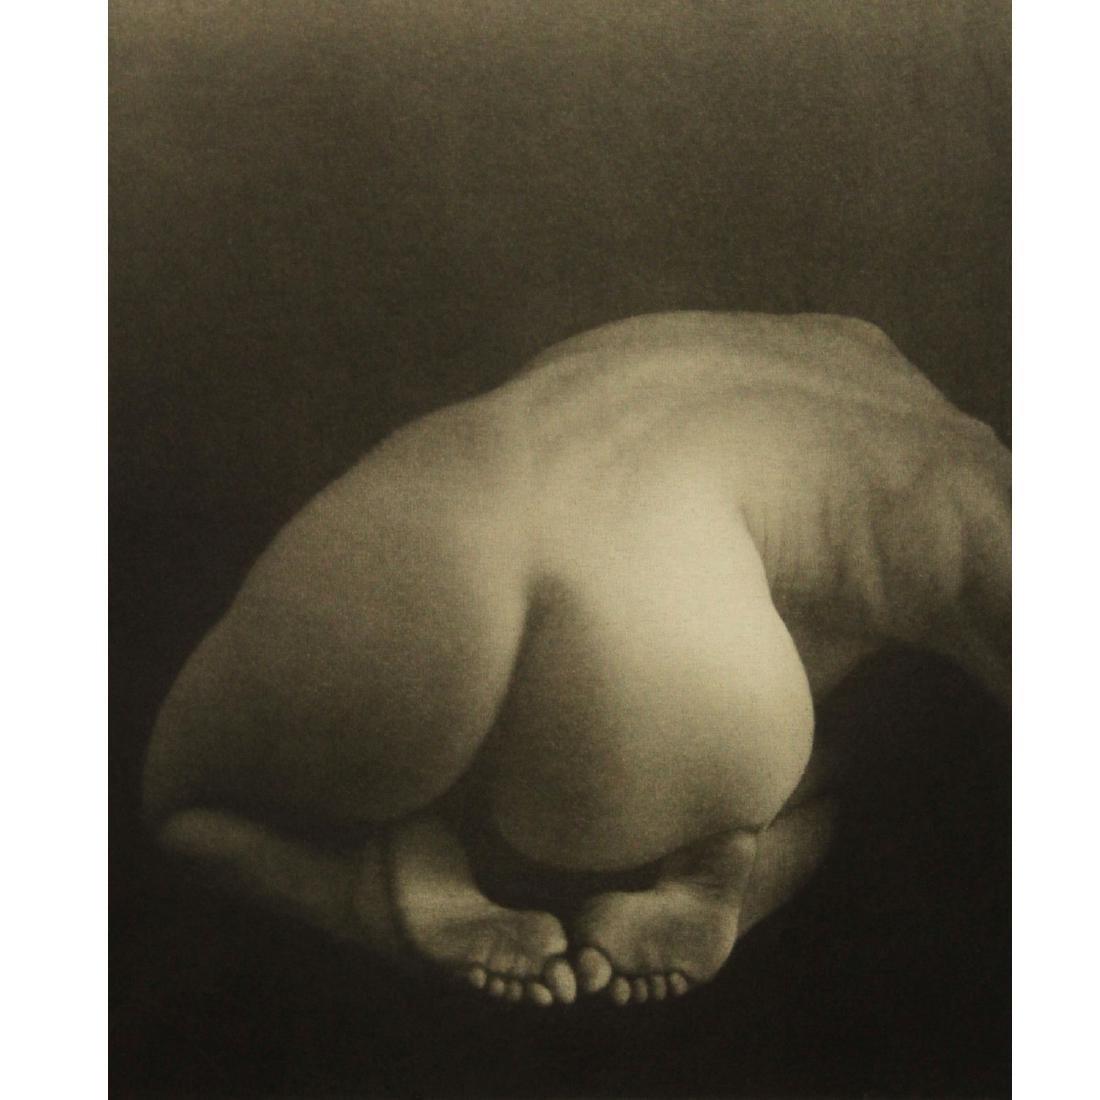 Mikio Watanabe (Japan, b.1954) - Compassion, Mezzotint.